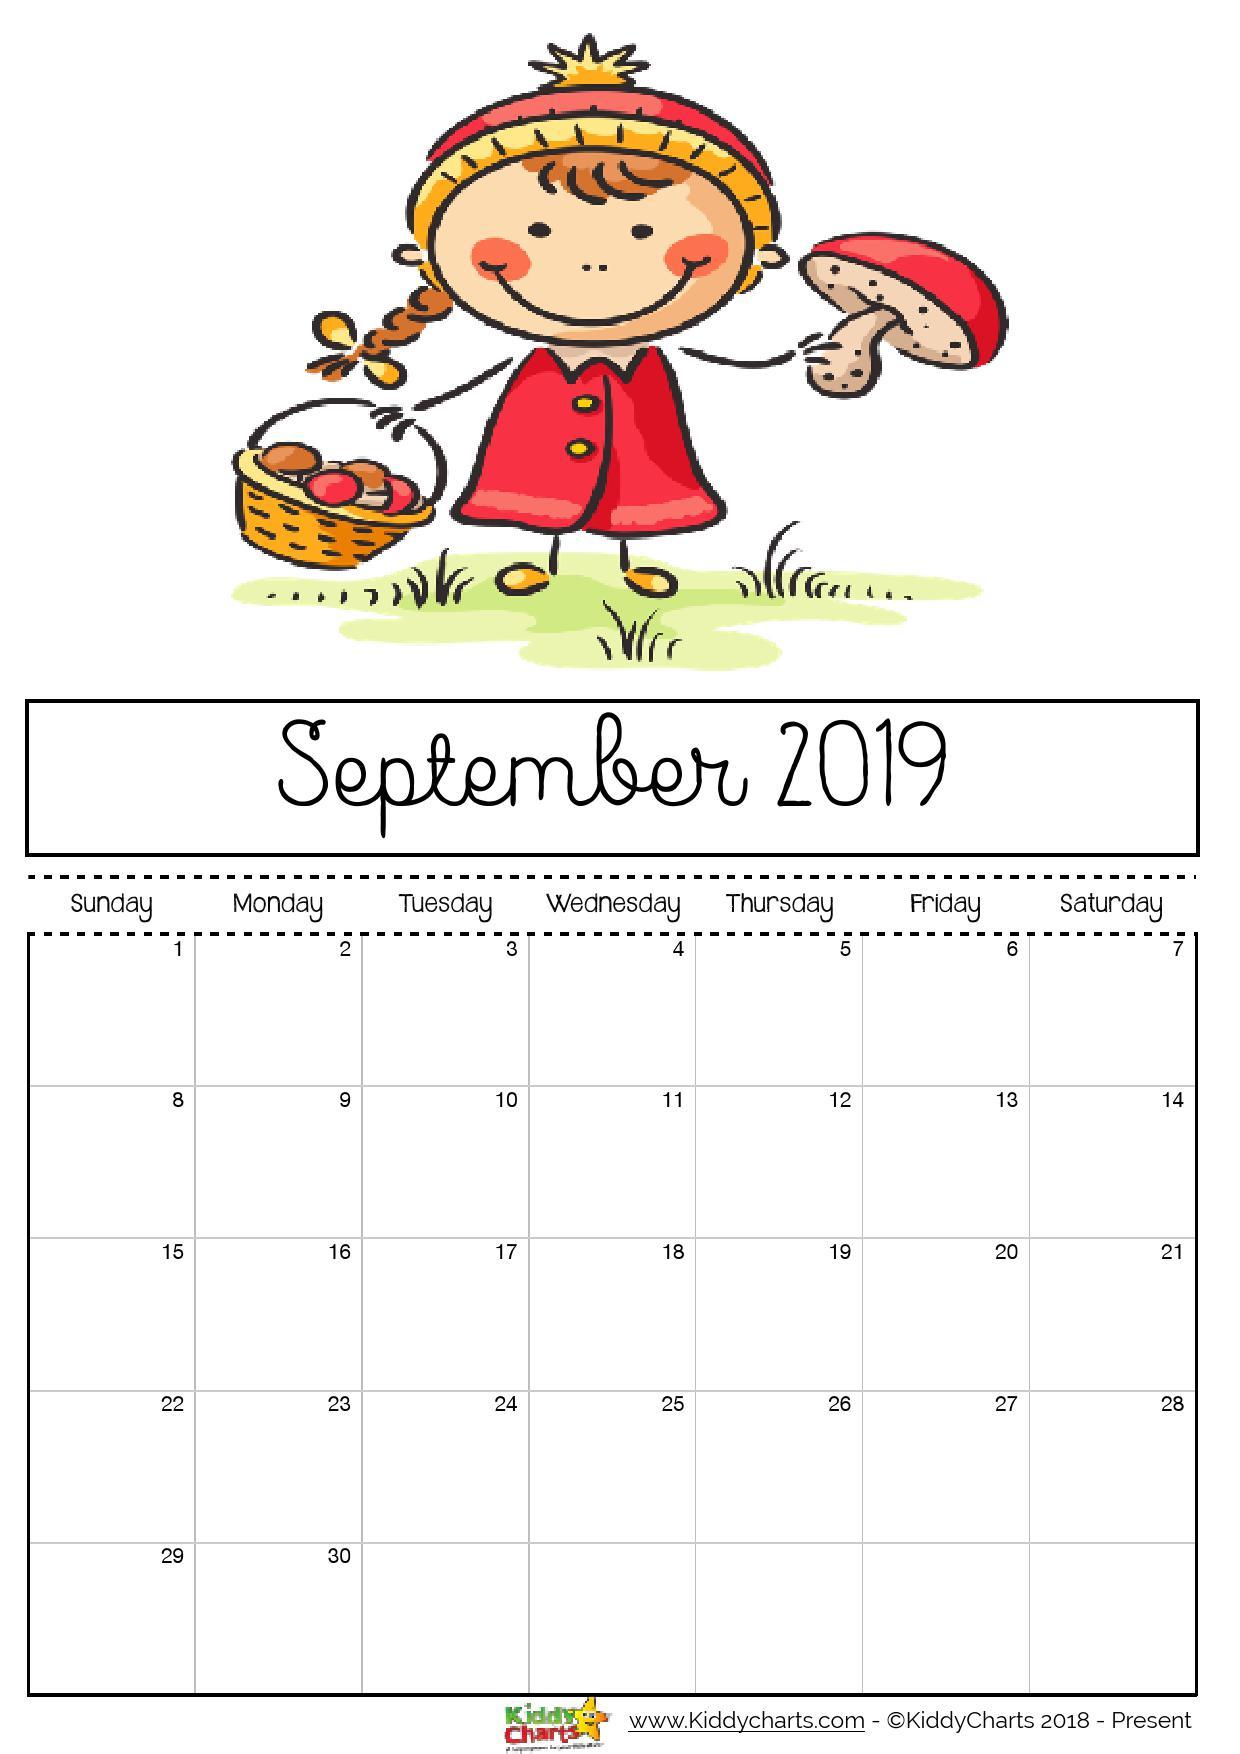 September printable 2019 calendar; girl foraging for mushrooms. What a great idea for September too! #printables #freeprintables #2019calendar